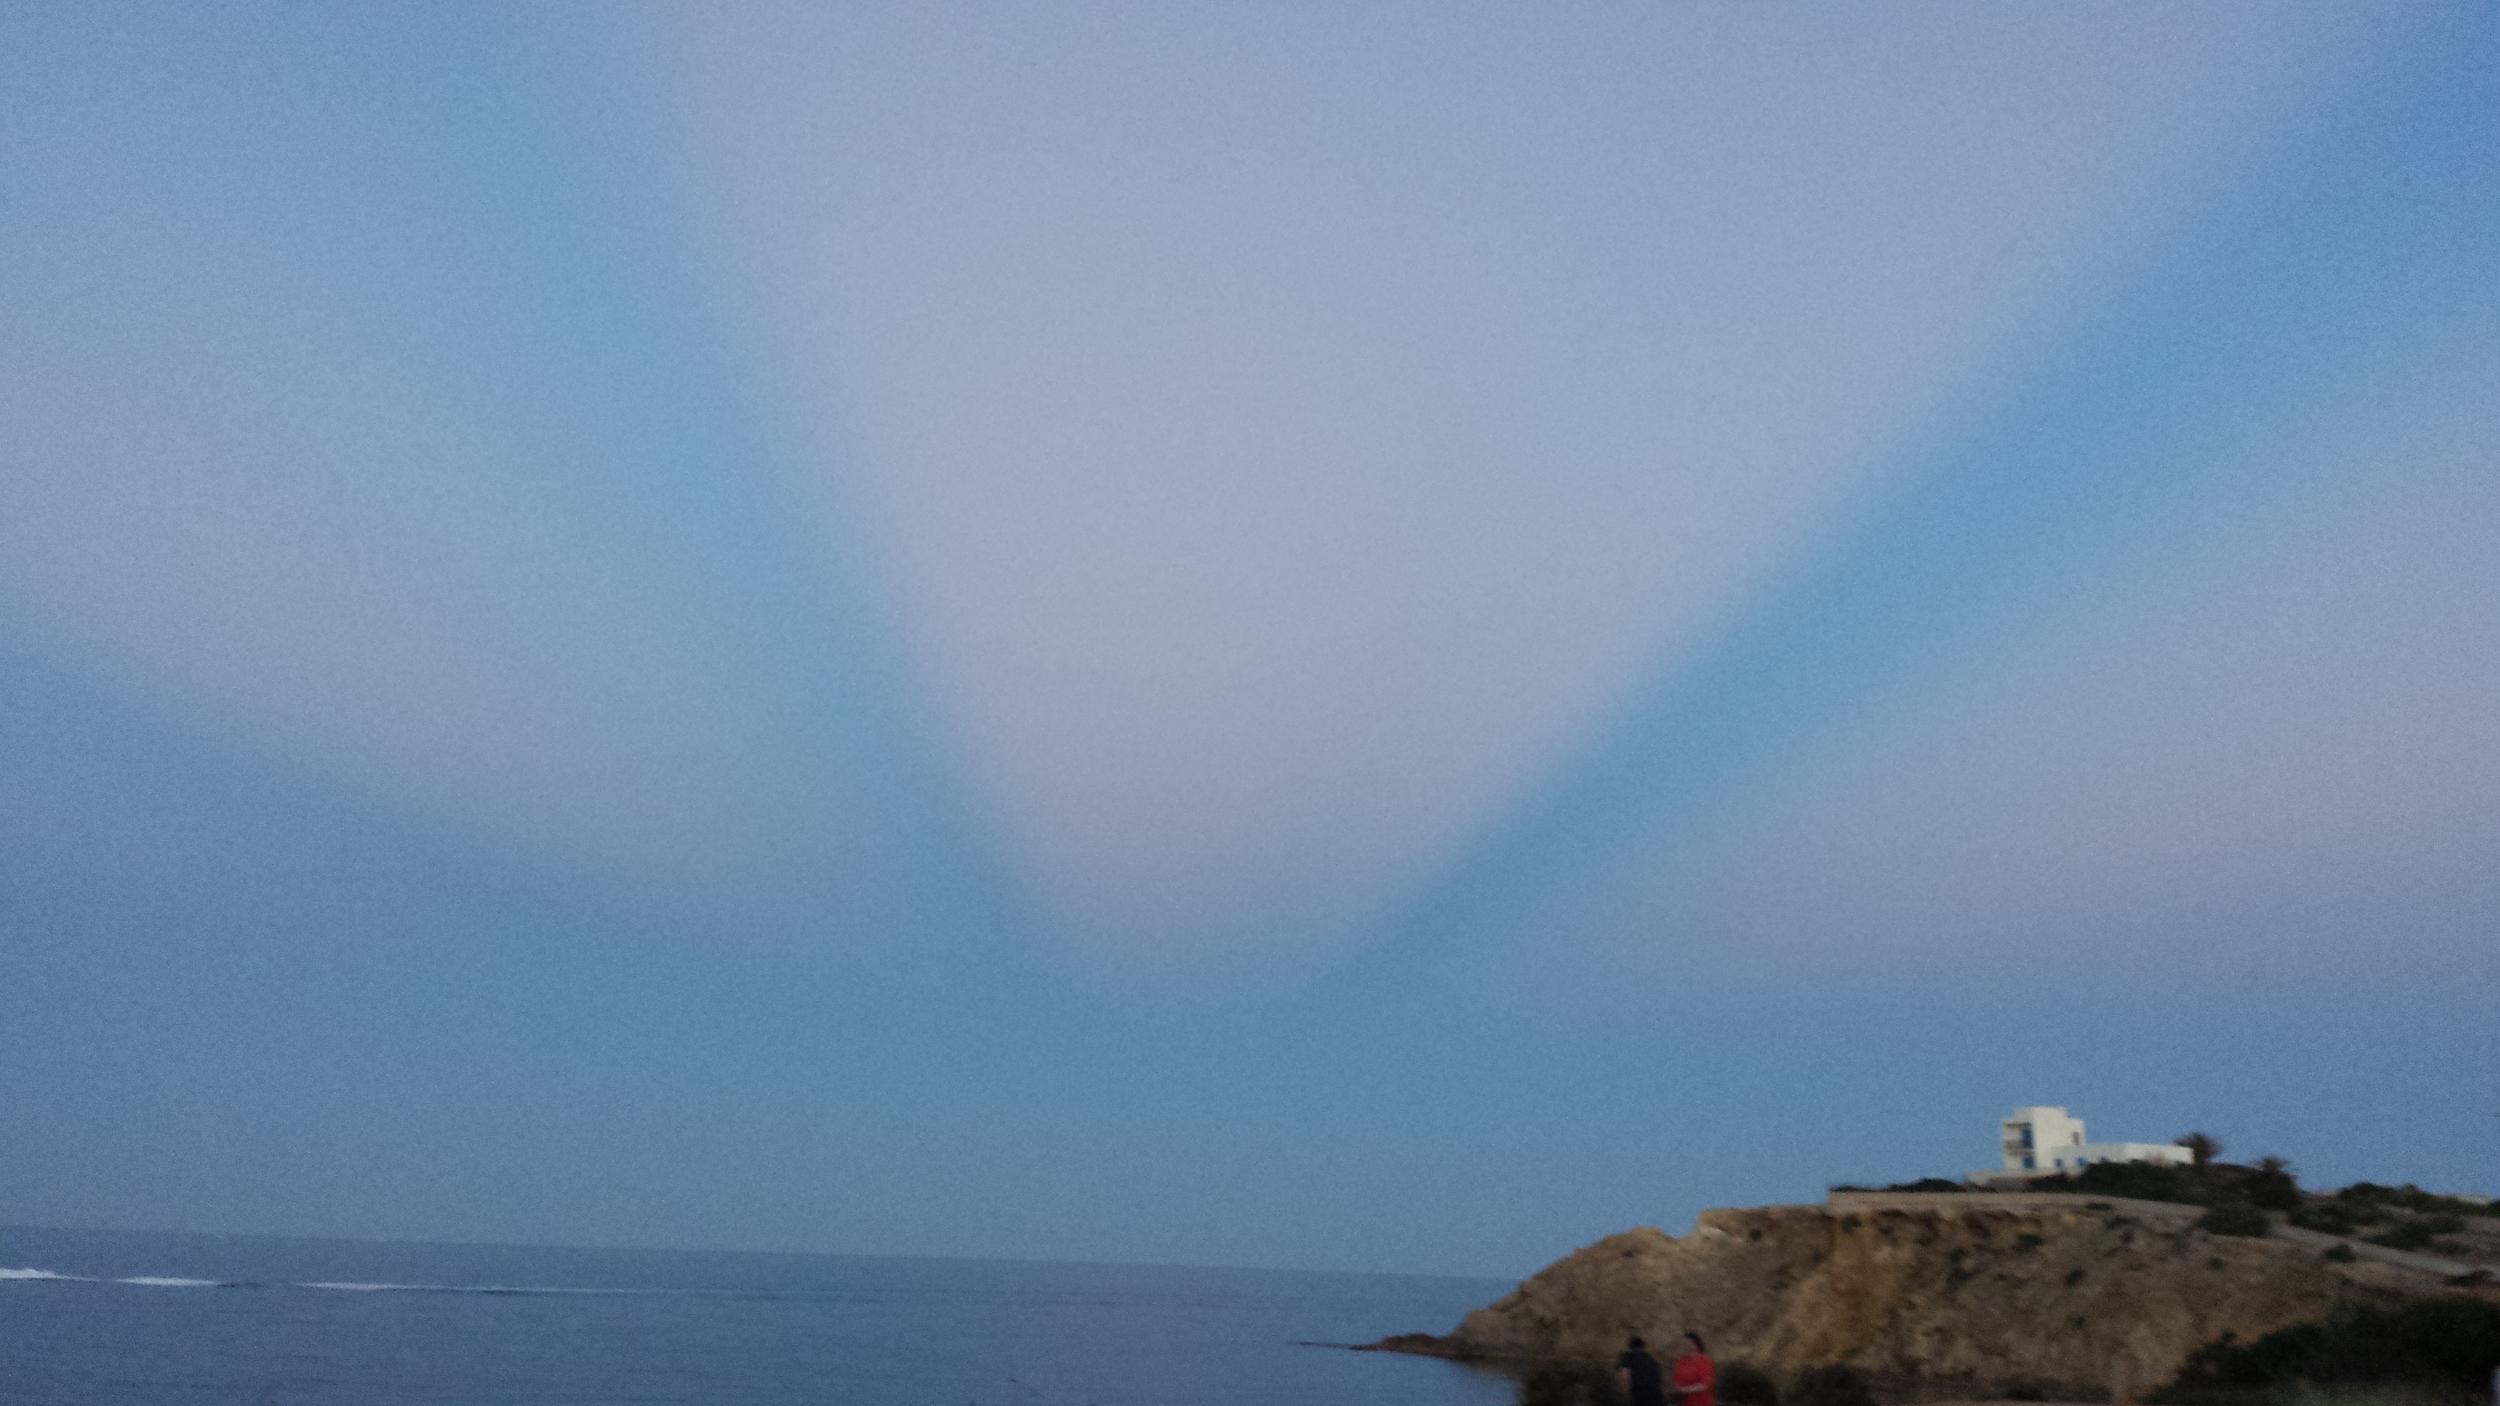 ibiza sky 2.jpg